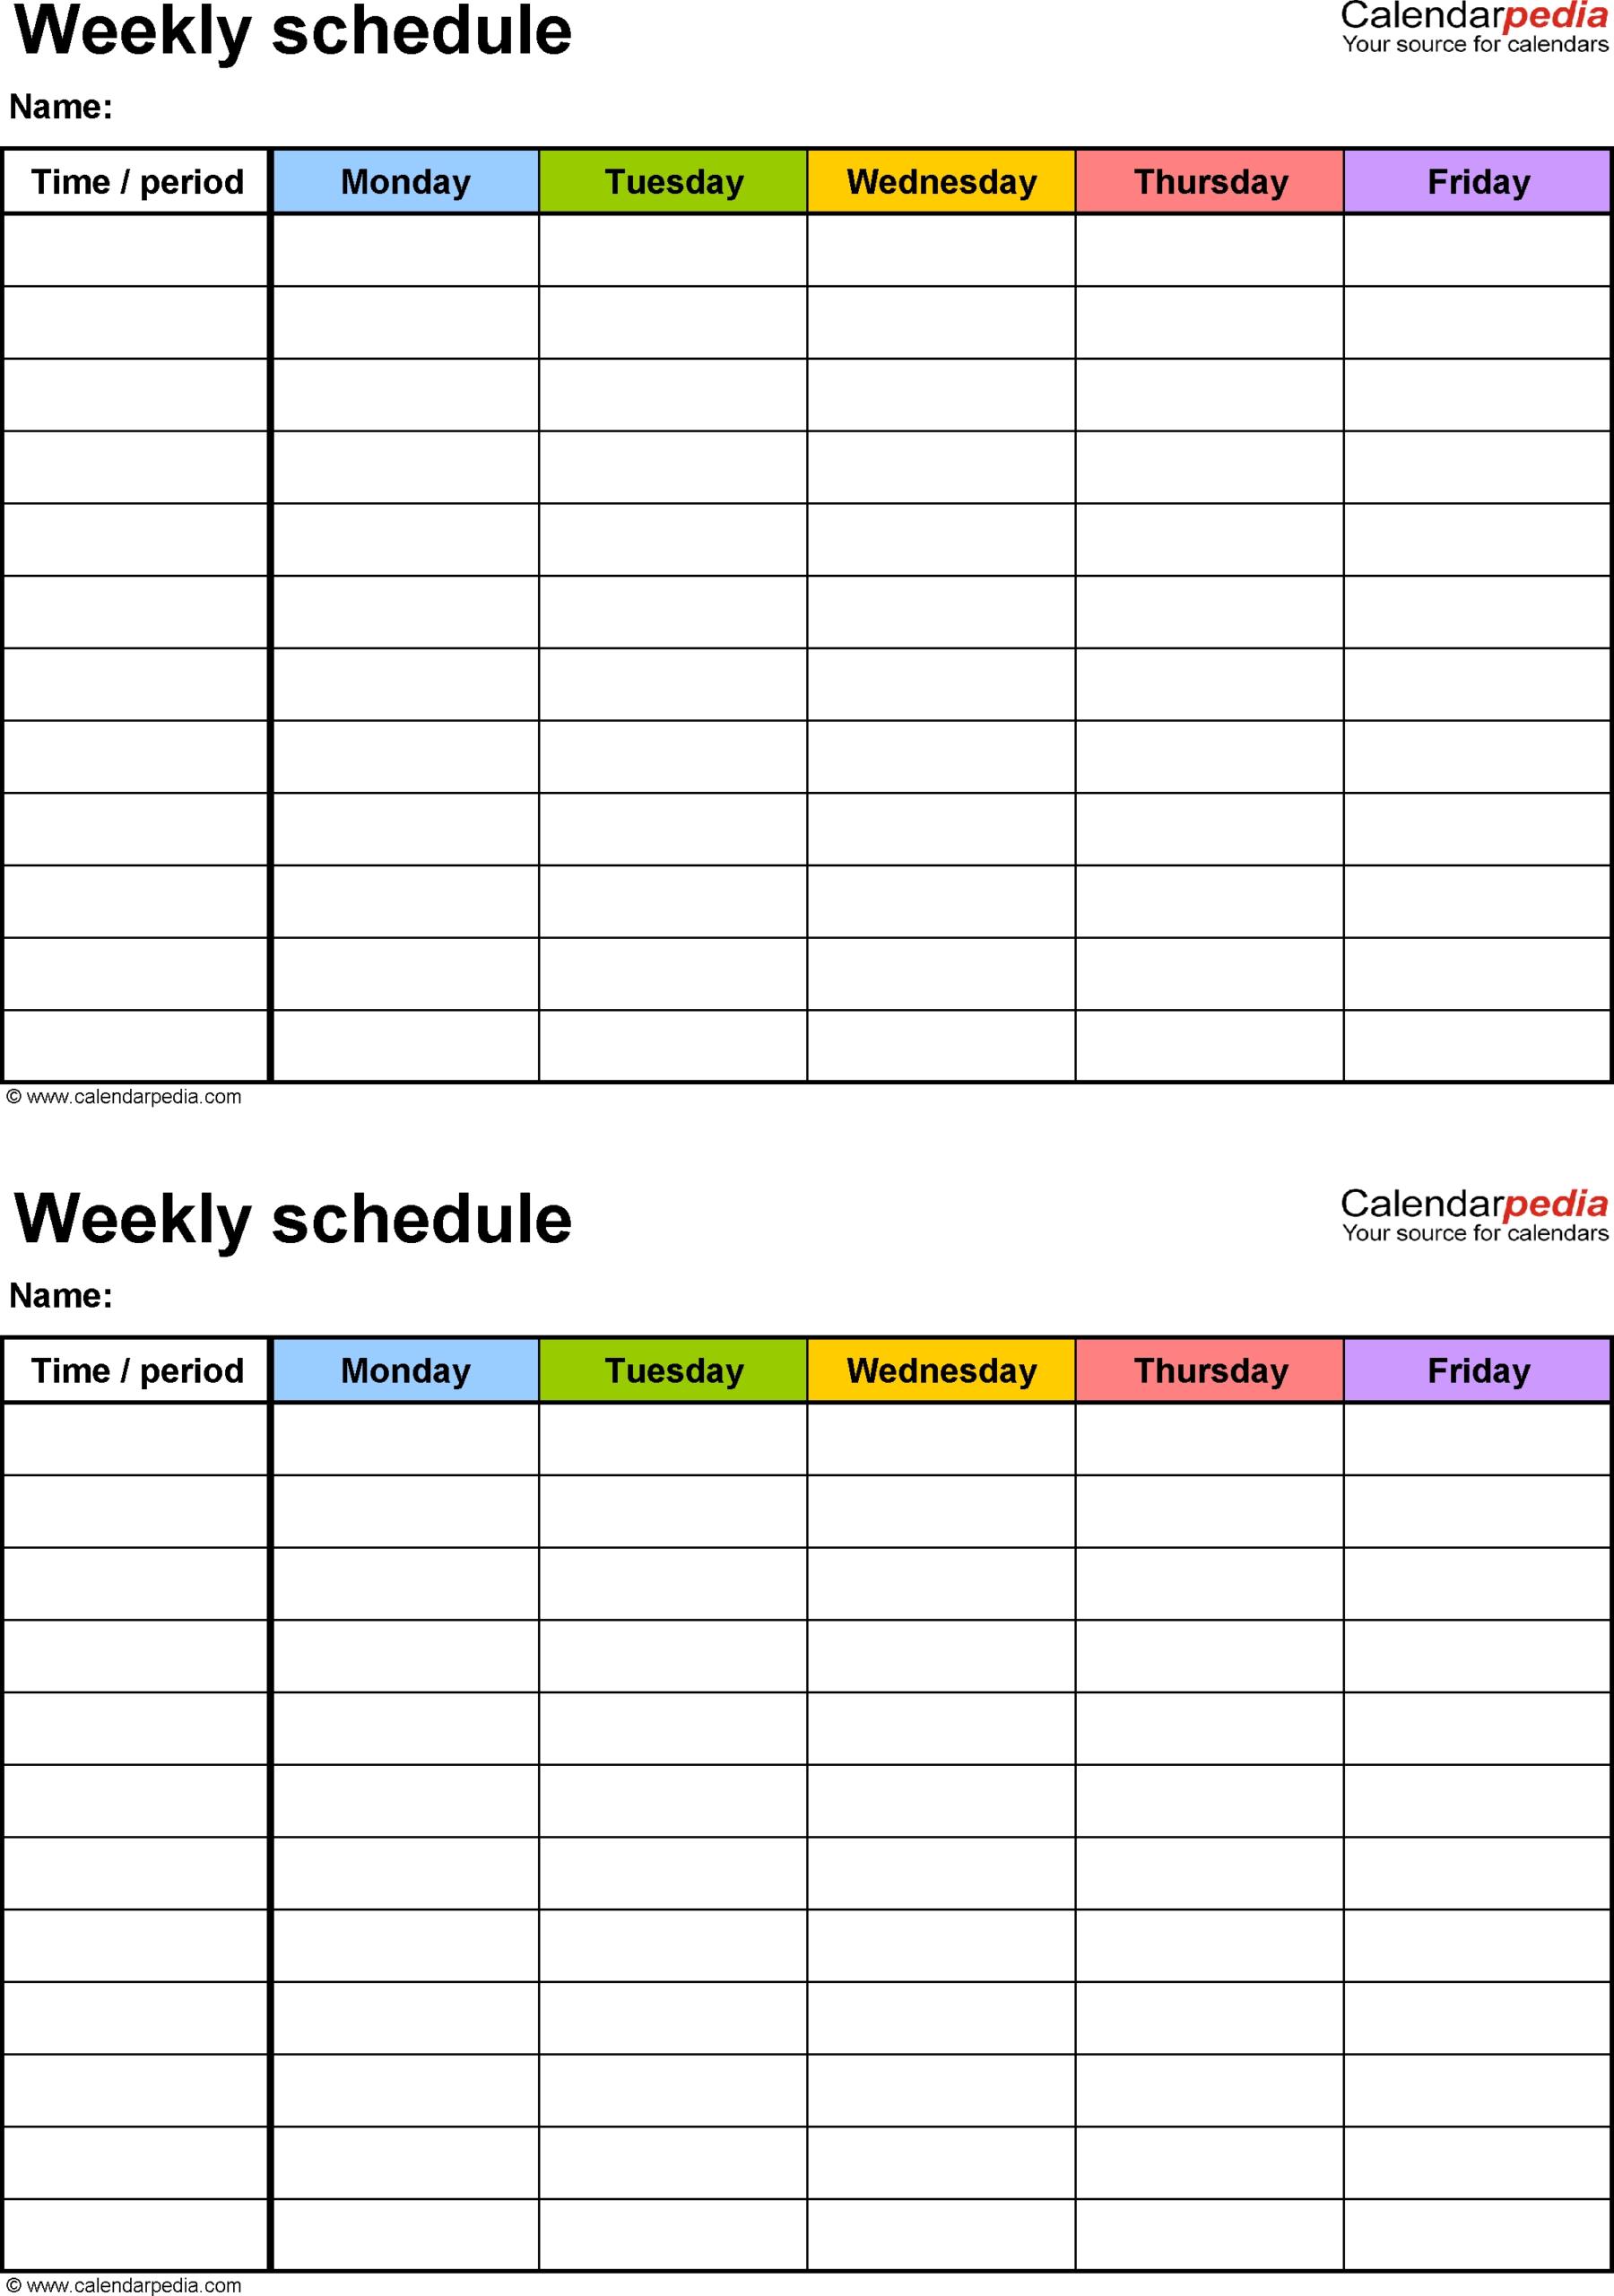 Blank Time Slot Week Schedules | Calendar Template Printable  Printable Weekly Calendar With Time Slots